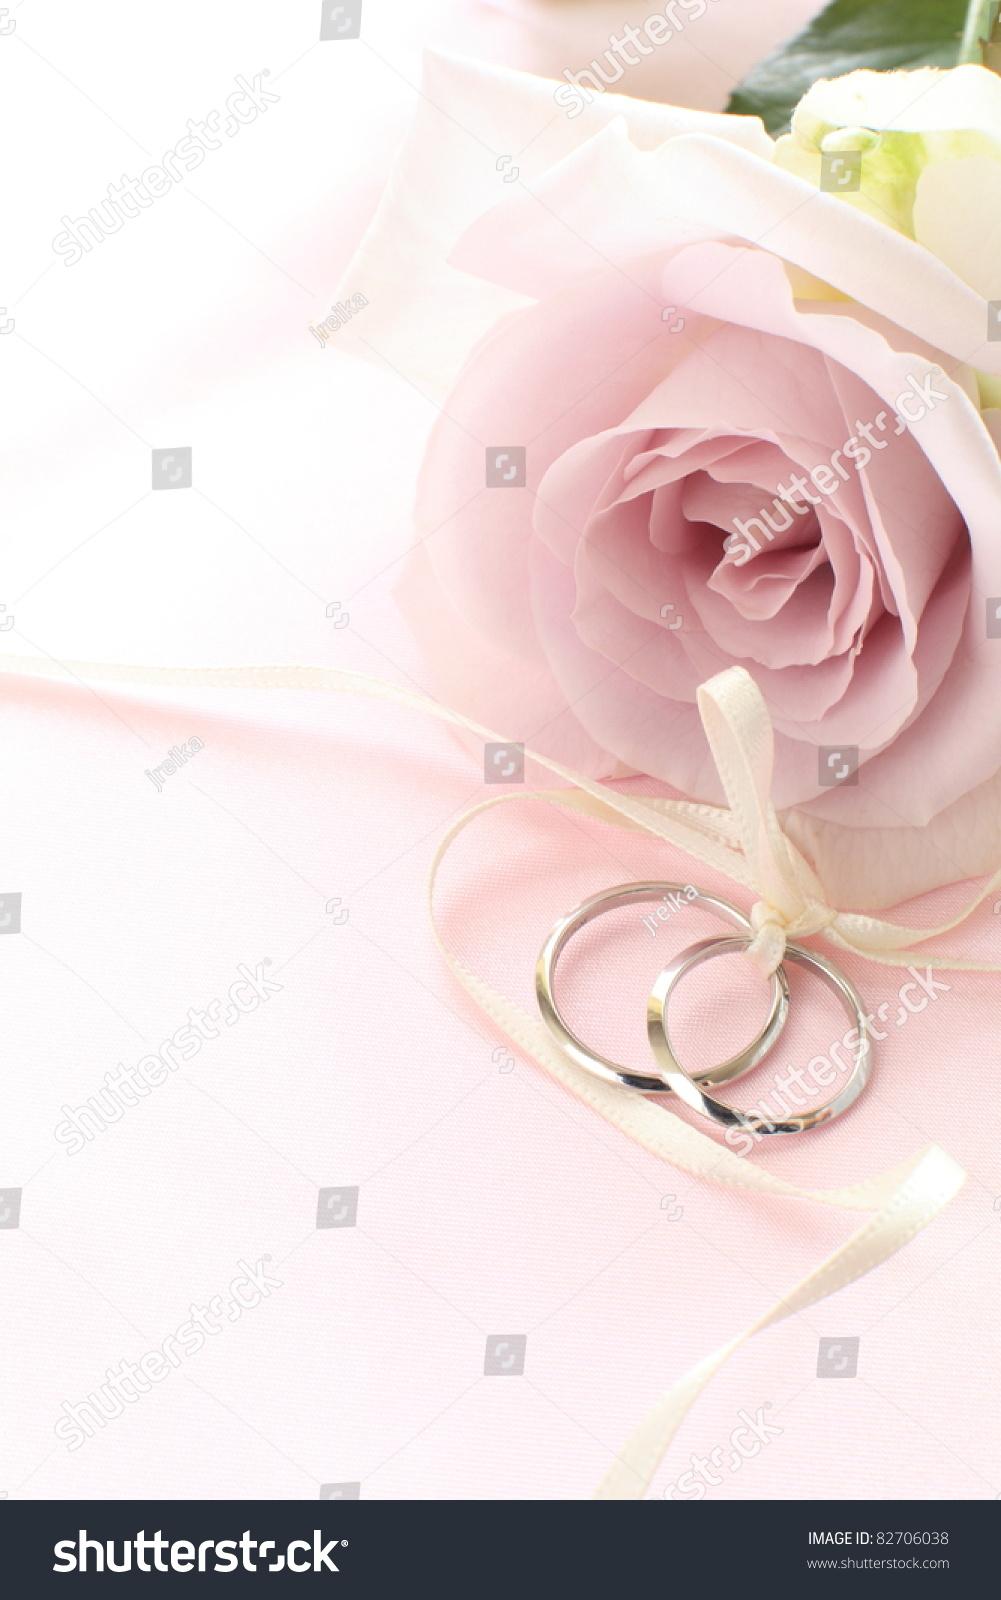 amethyst diamond cushion ring 14k white gold purple wedding rings Amethyst and Diamond Halo Cushion Ring in 14k White Gold 0 17 ct tw